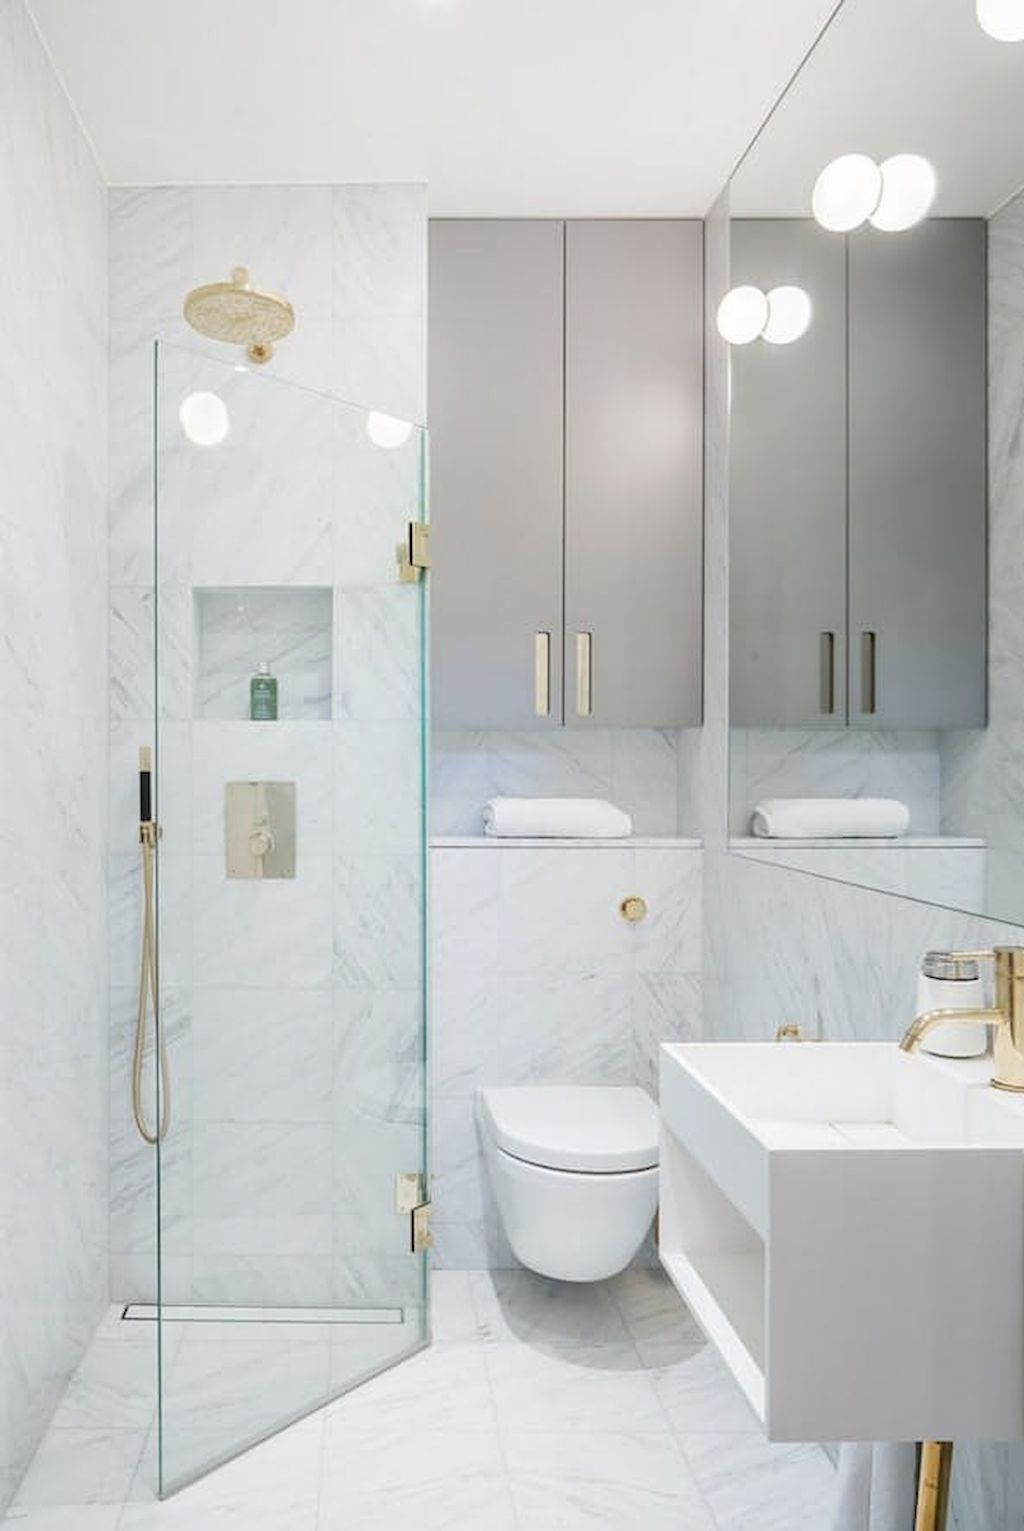 Cool small master bathroom remodel ideas on a budget (22)   Bathroom ...